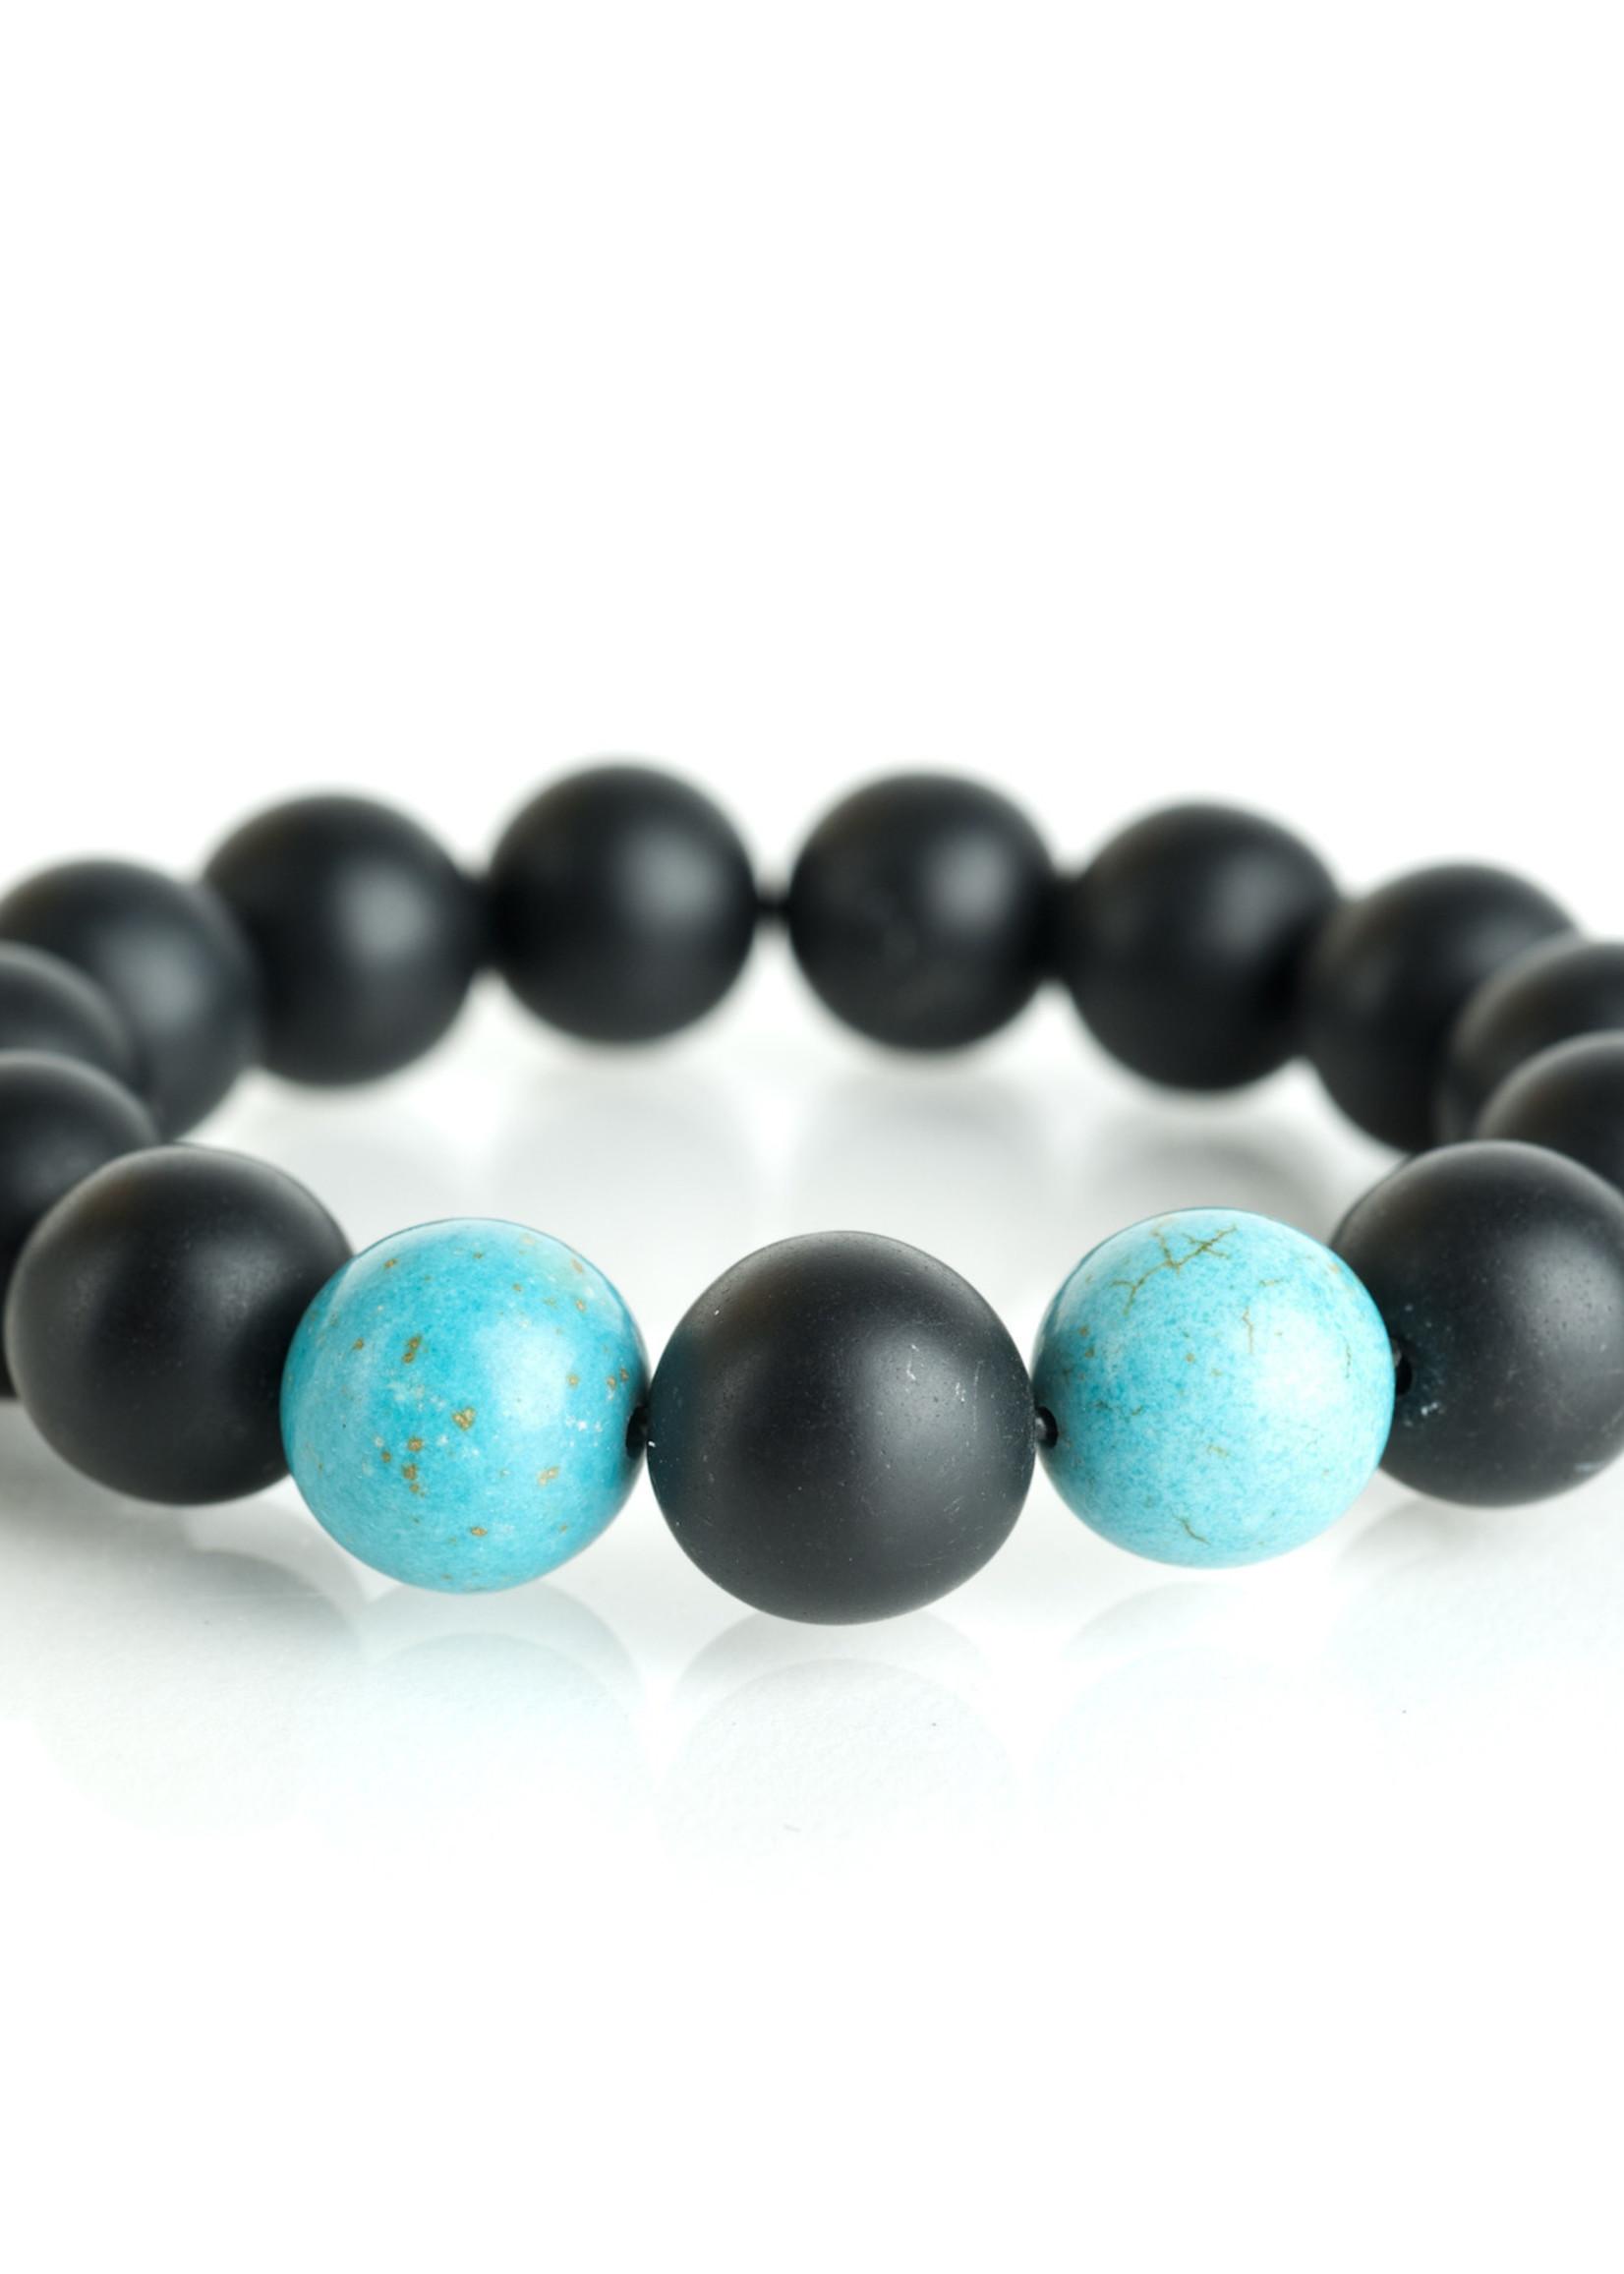 Mina Danielle Black Onyx with Turquoise Beads